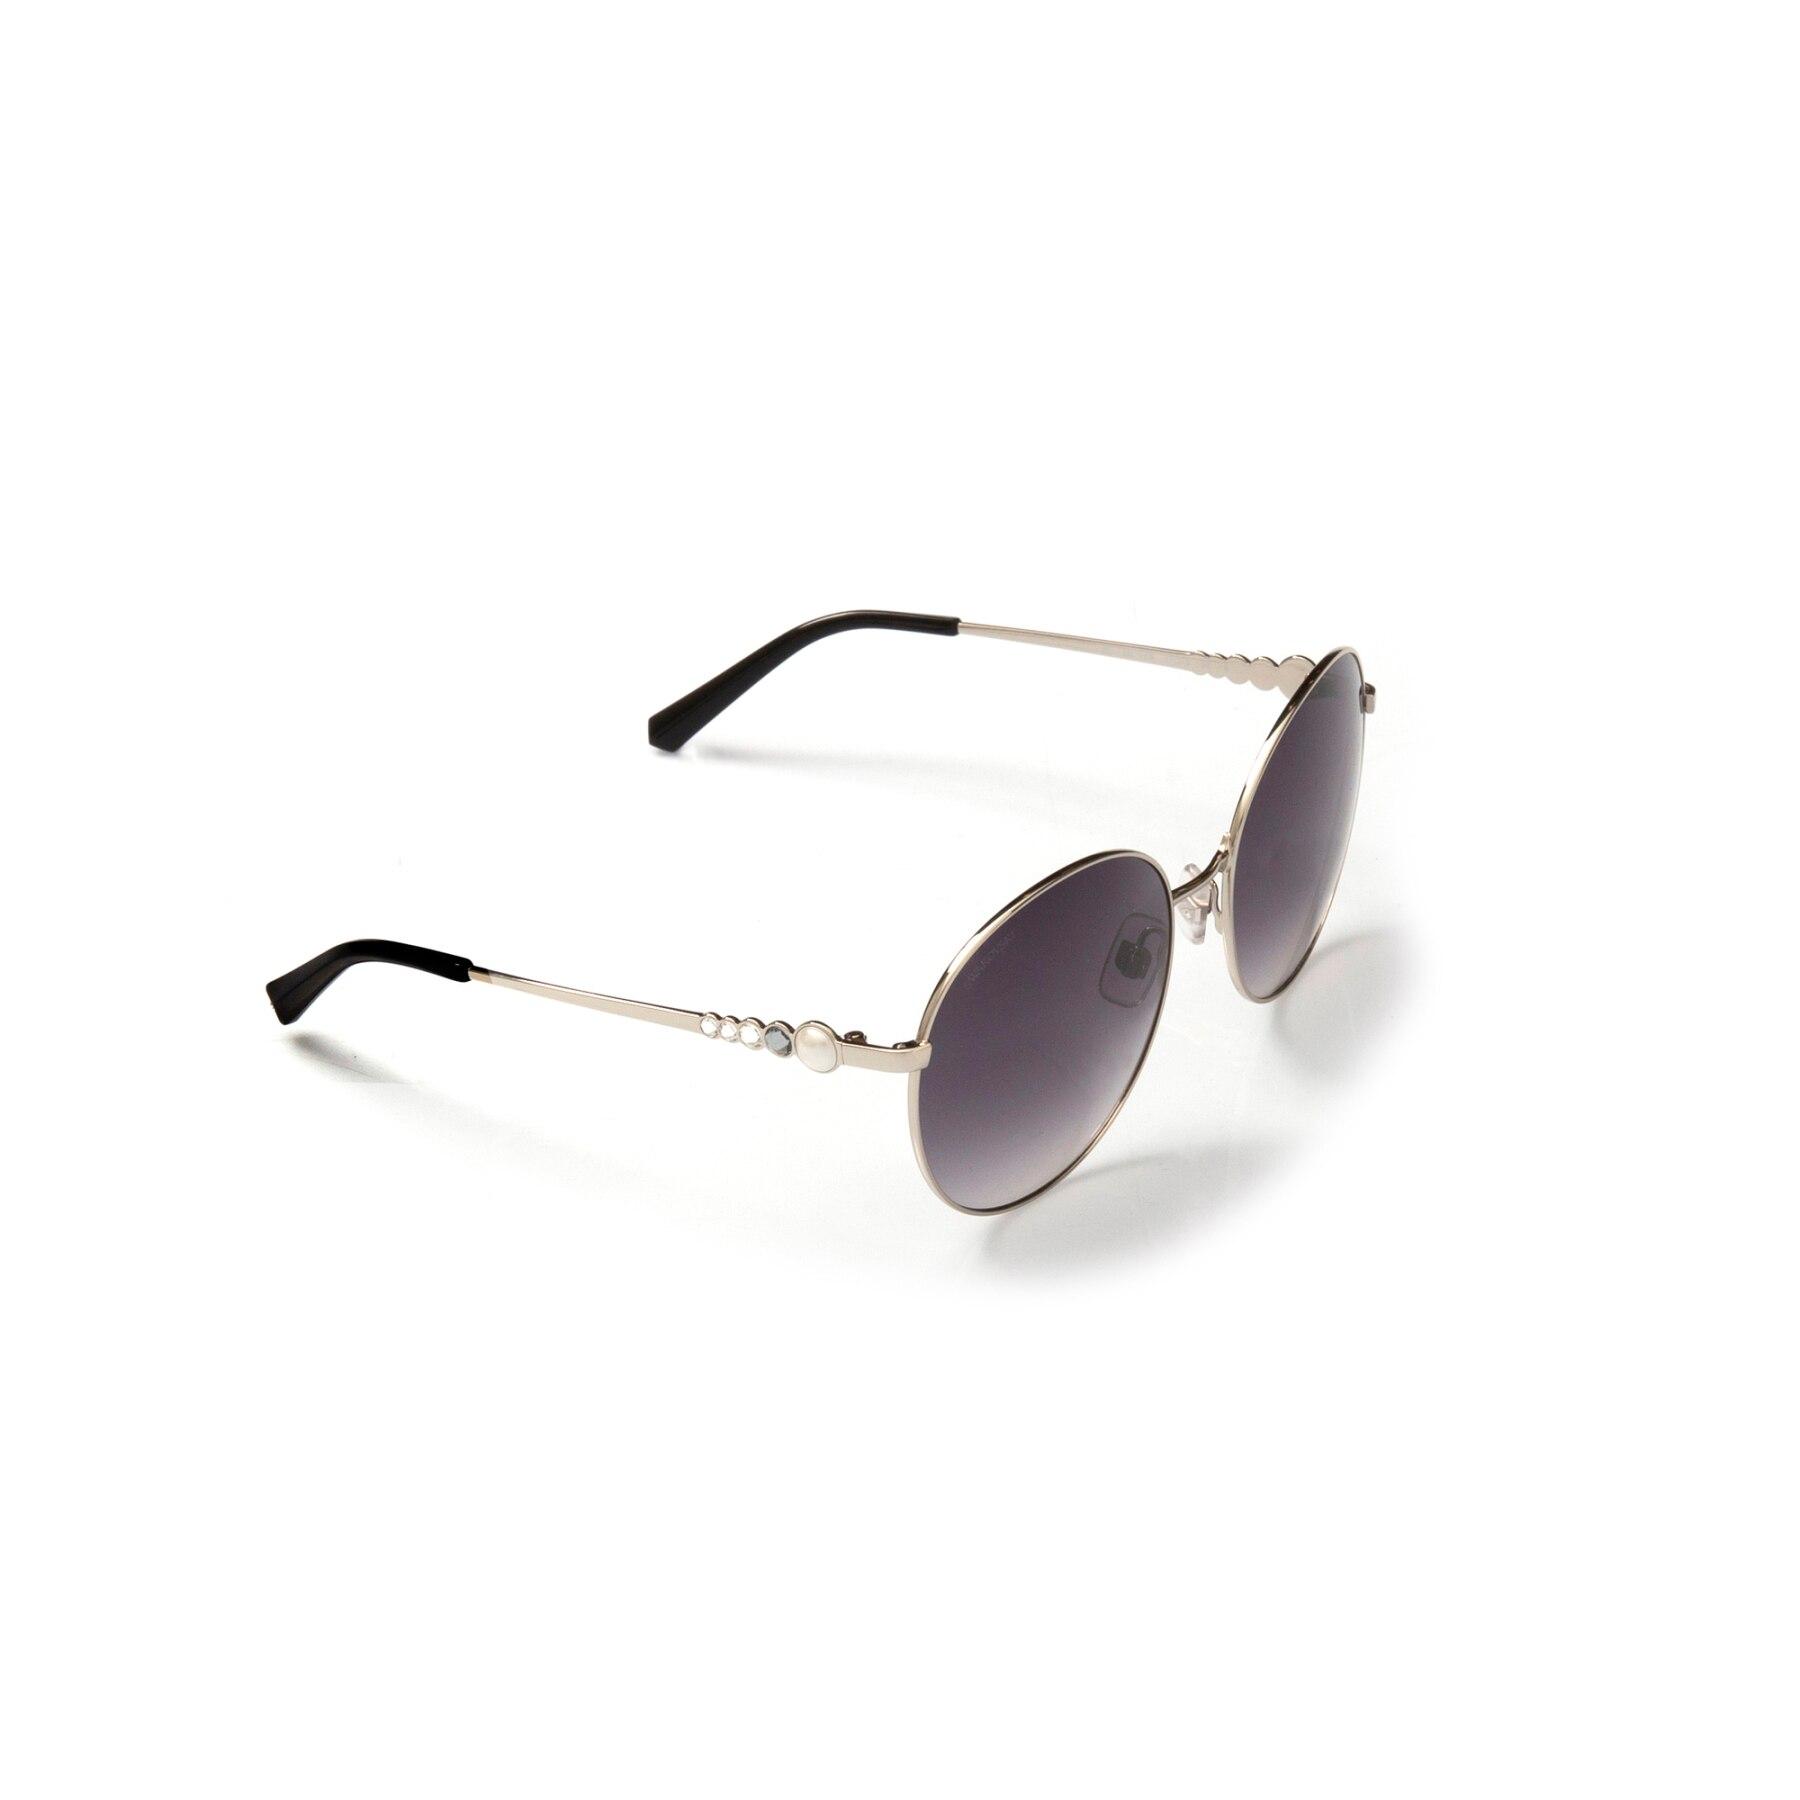 Women's sunglasses swr 0180 16b metal silver organic round round 61-19-135 swarovski